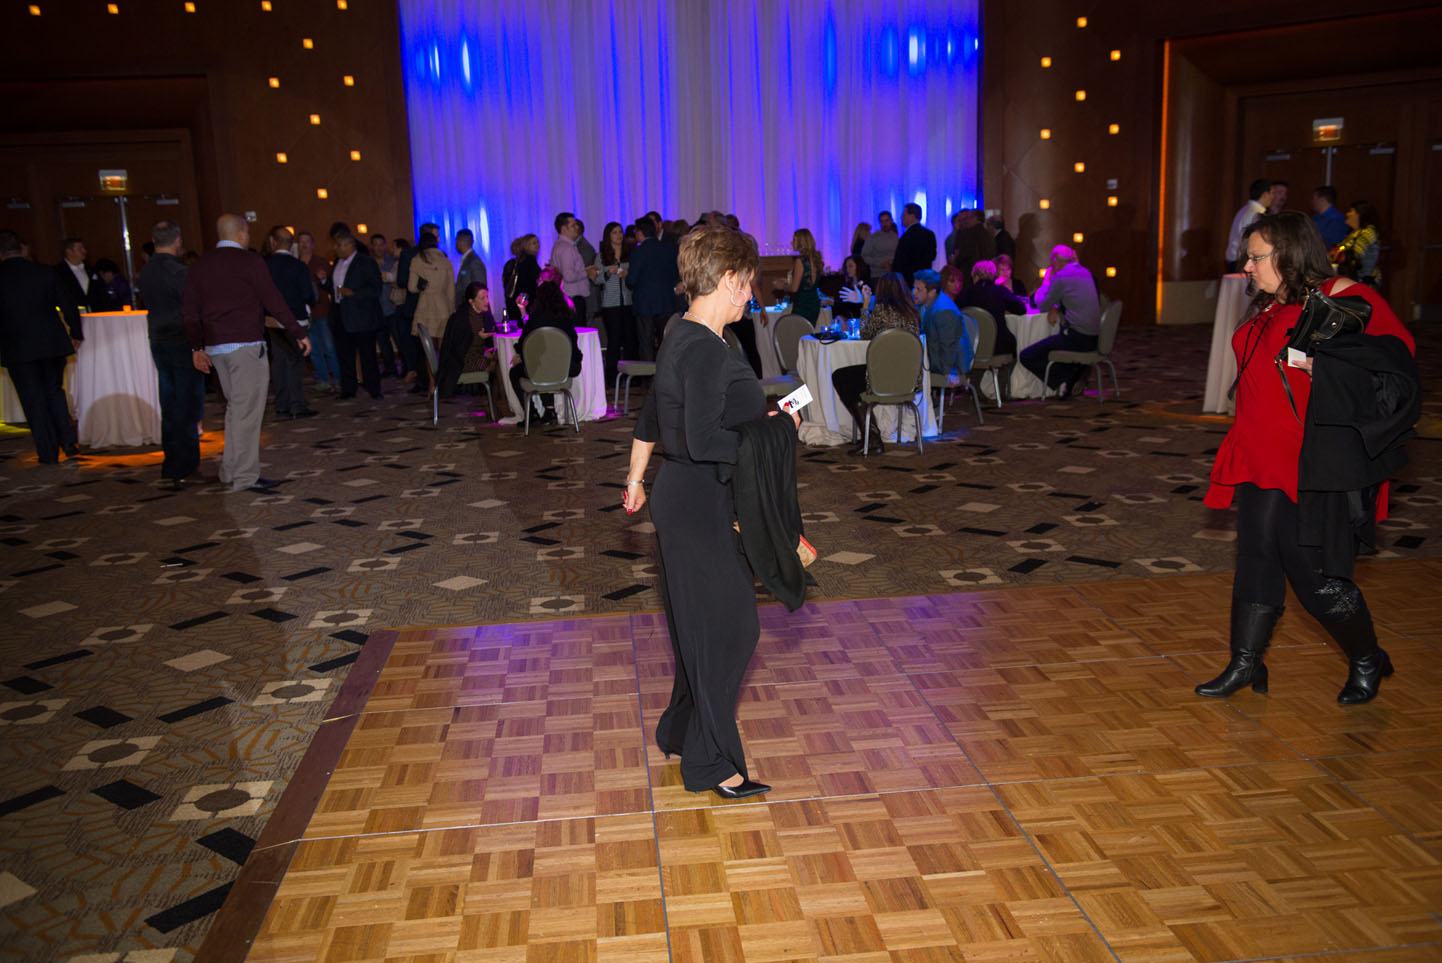 2015-12-09 ReMax Corpoarte Event - The Borgata - Atlantic City NJ - Photo Sesh - 2015-5079.jpg